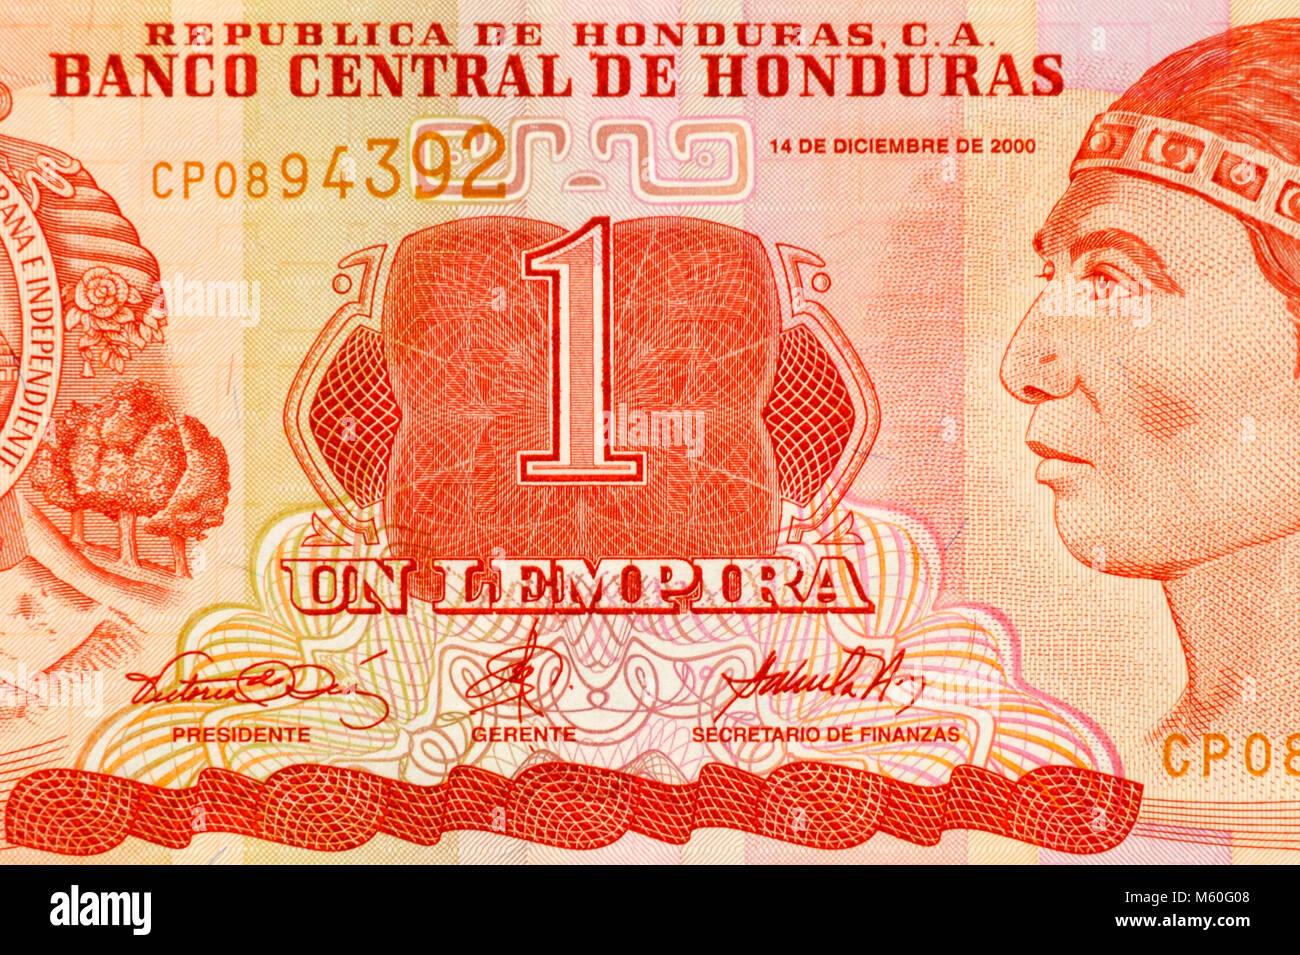 Honduras One 1 Lempira Bank Note - Stock Image